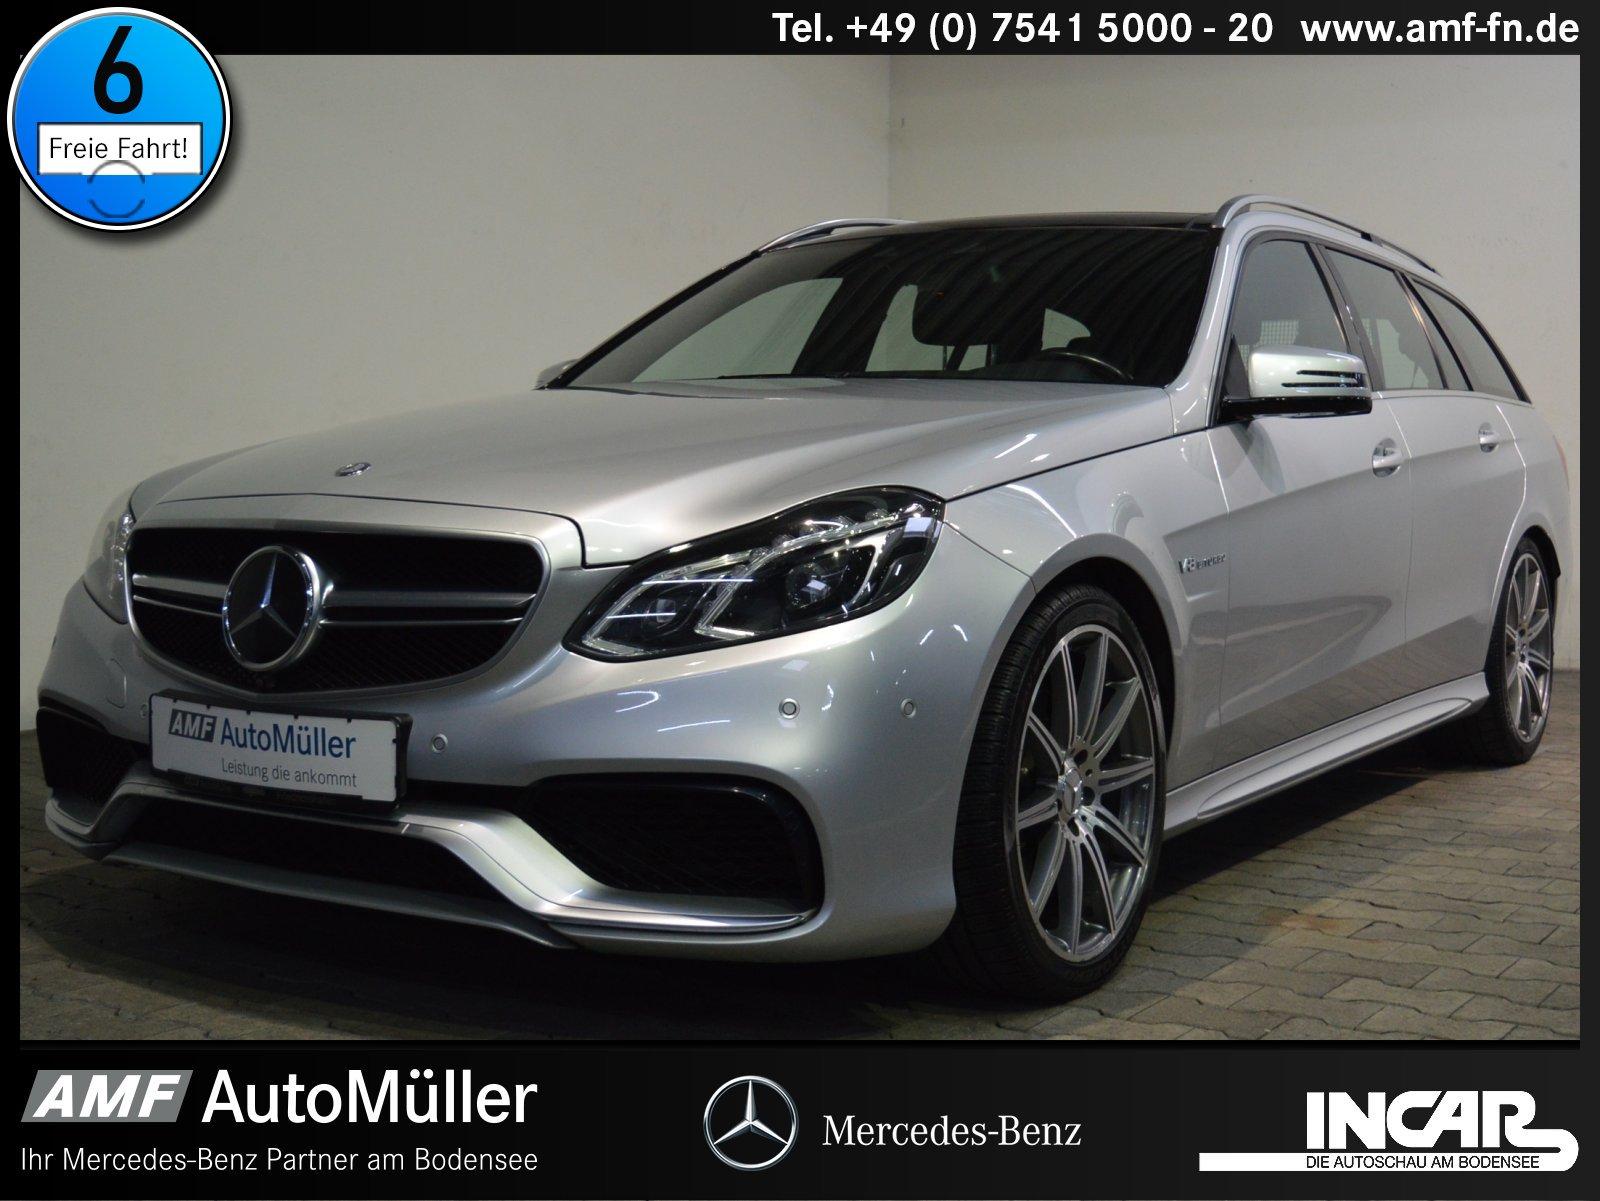 Mercedes-Benz E 63 AMG T 4M DIRSTRO+360°+ILS+MULTIK.+DRIVERSP., Jahr 2013, Benzin